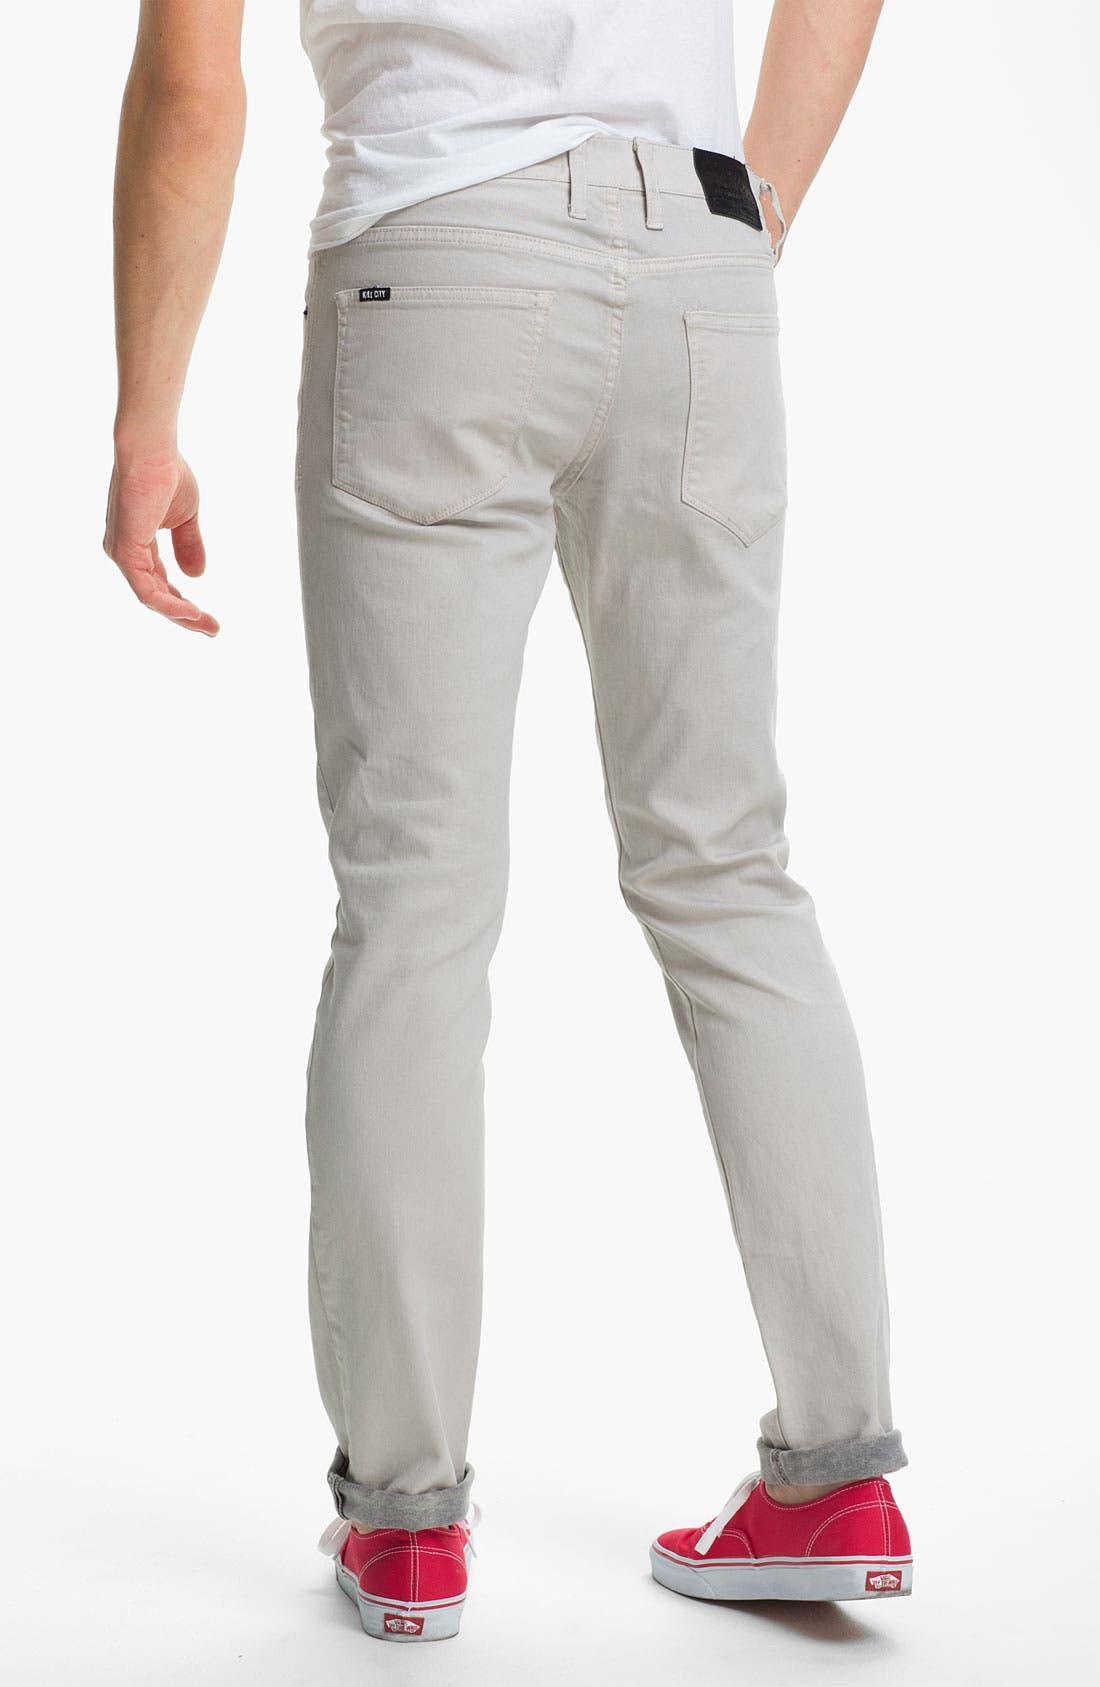 Alternate Image 1 Selected - Kill City 'Wire' Slim Skinny Leg Jeans (White)